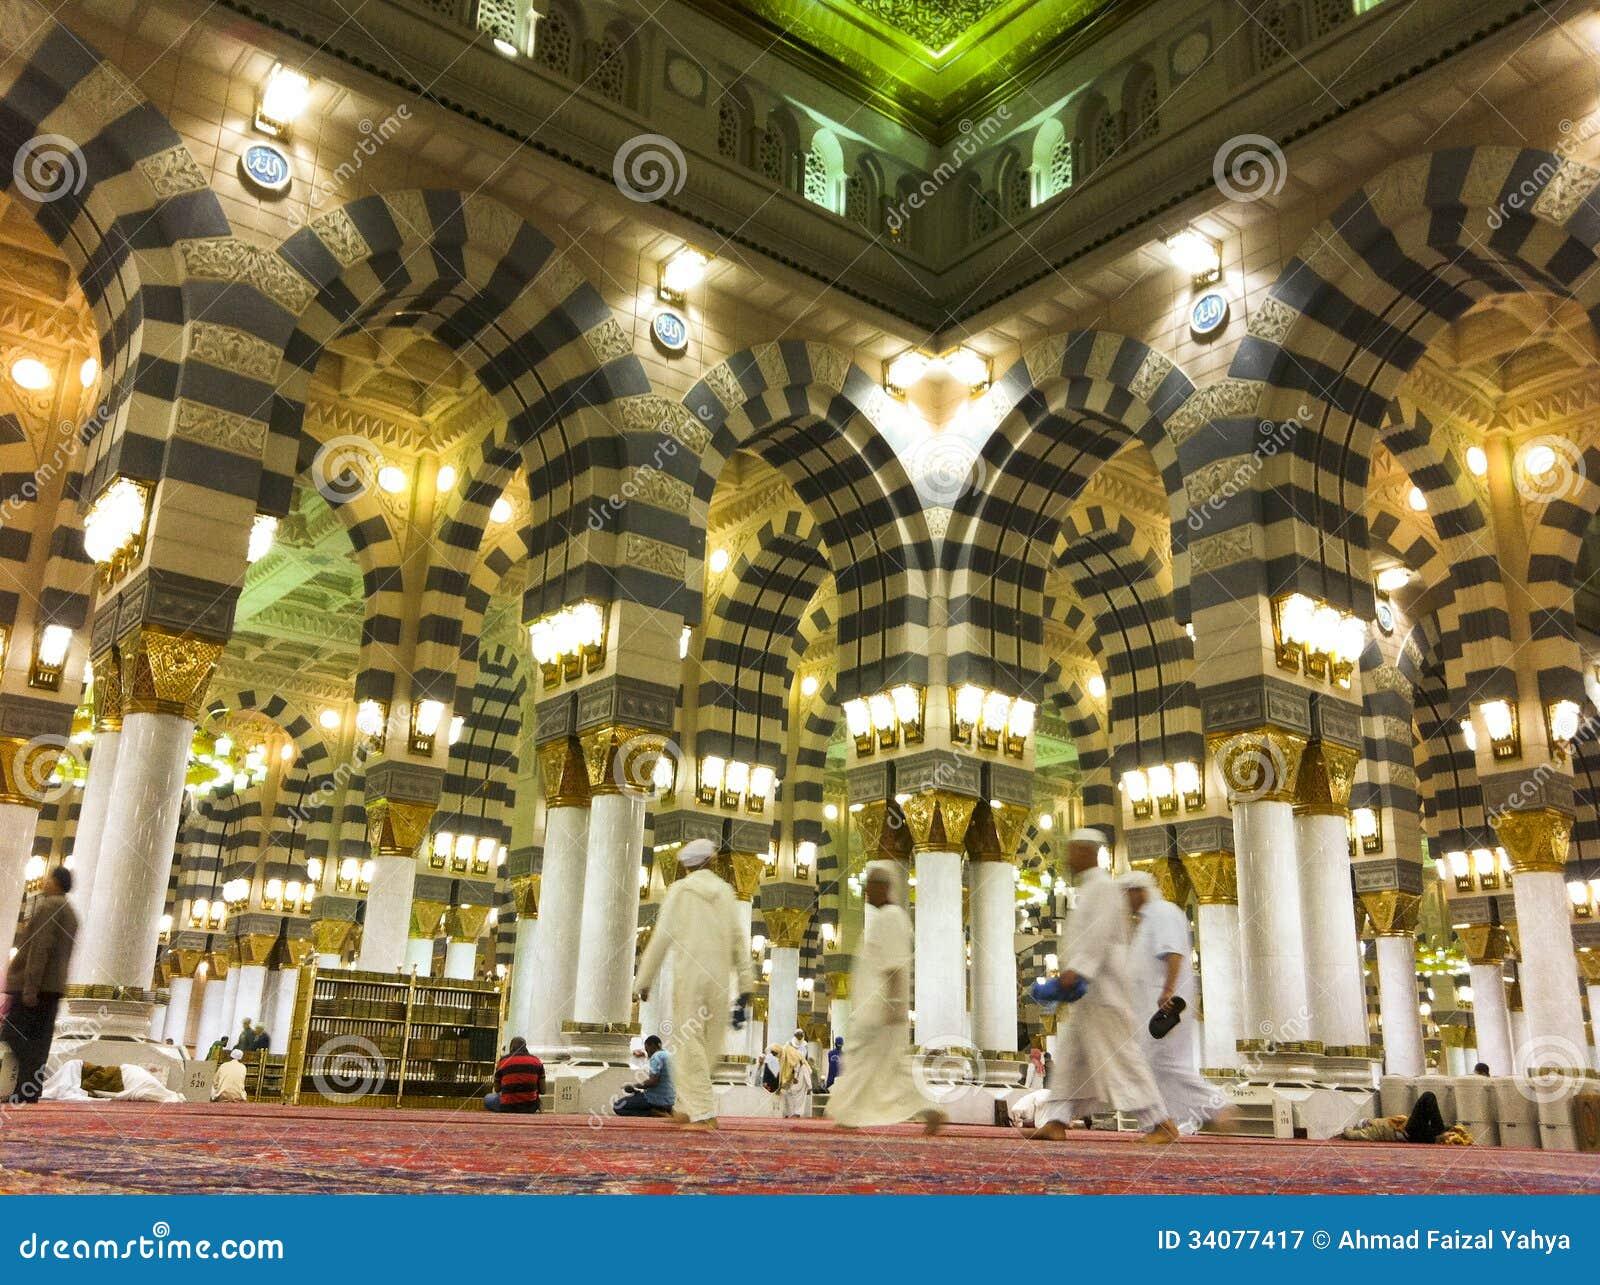 AL MADINAH, KINGDOM OF SAUDI ARABIA-FEB  19: Muslim Men Walk